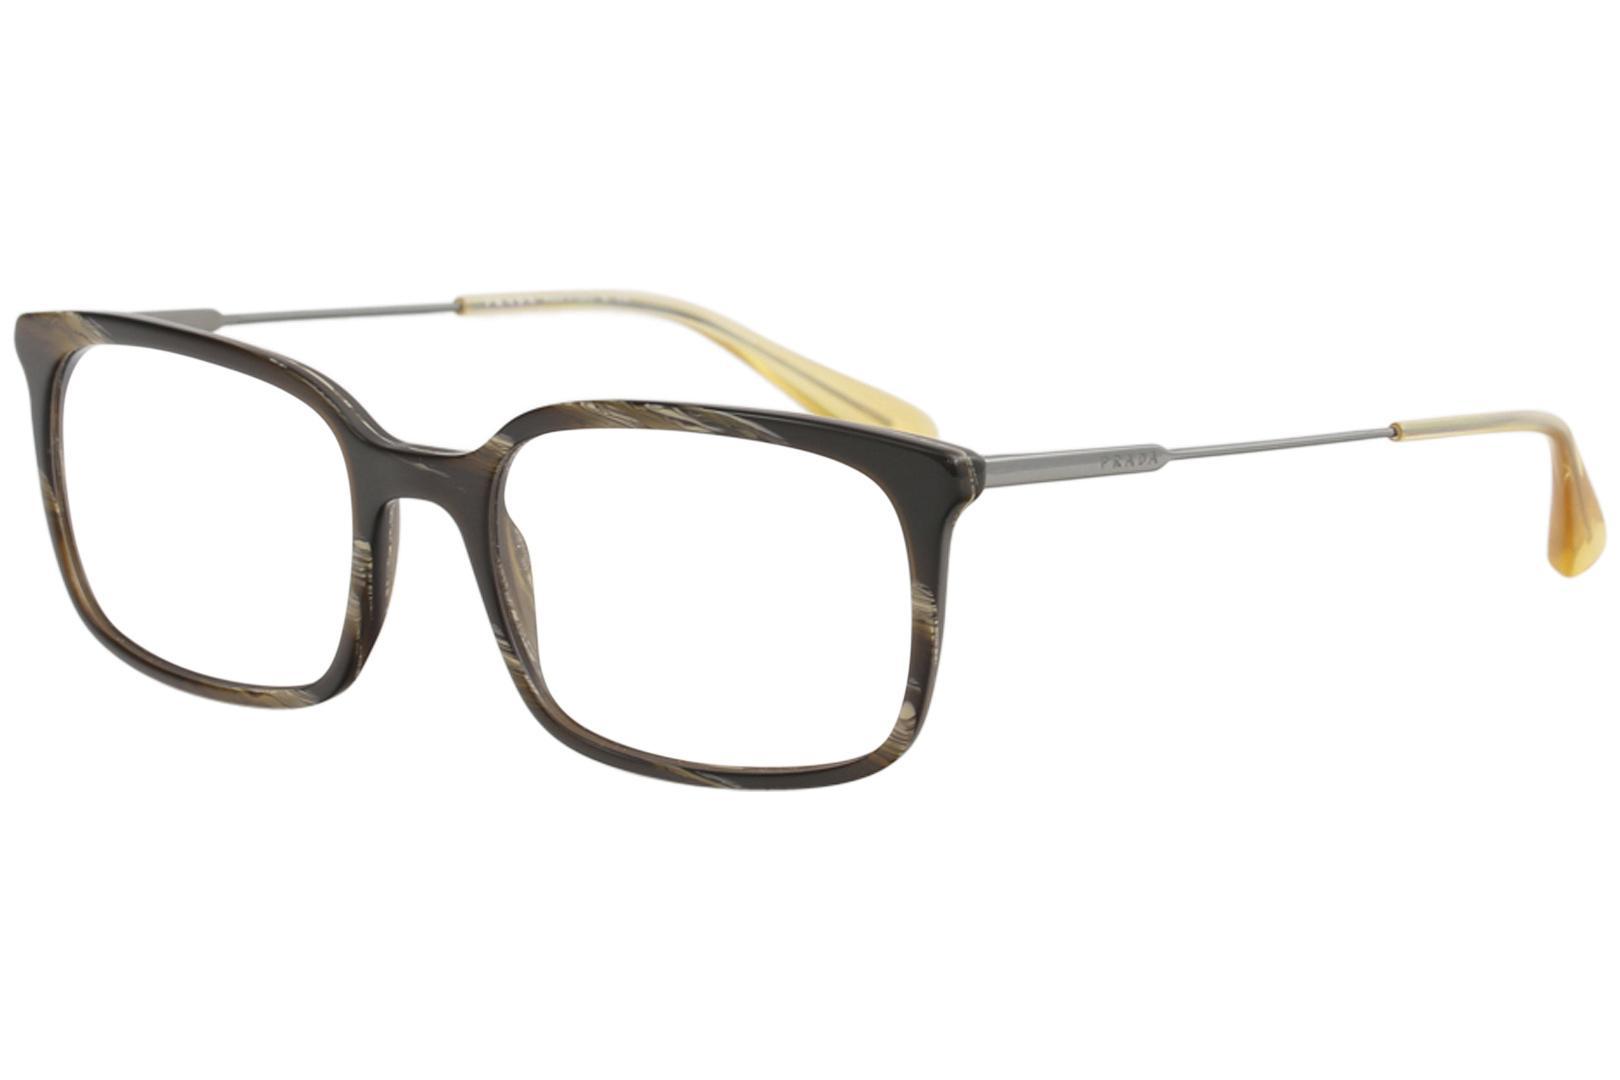 9504289dca3 Prada Men s Eyeglasses VPR16U VPR 16U Full Rim Optical Frame